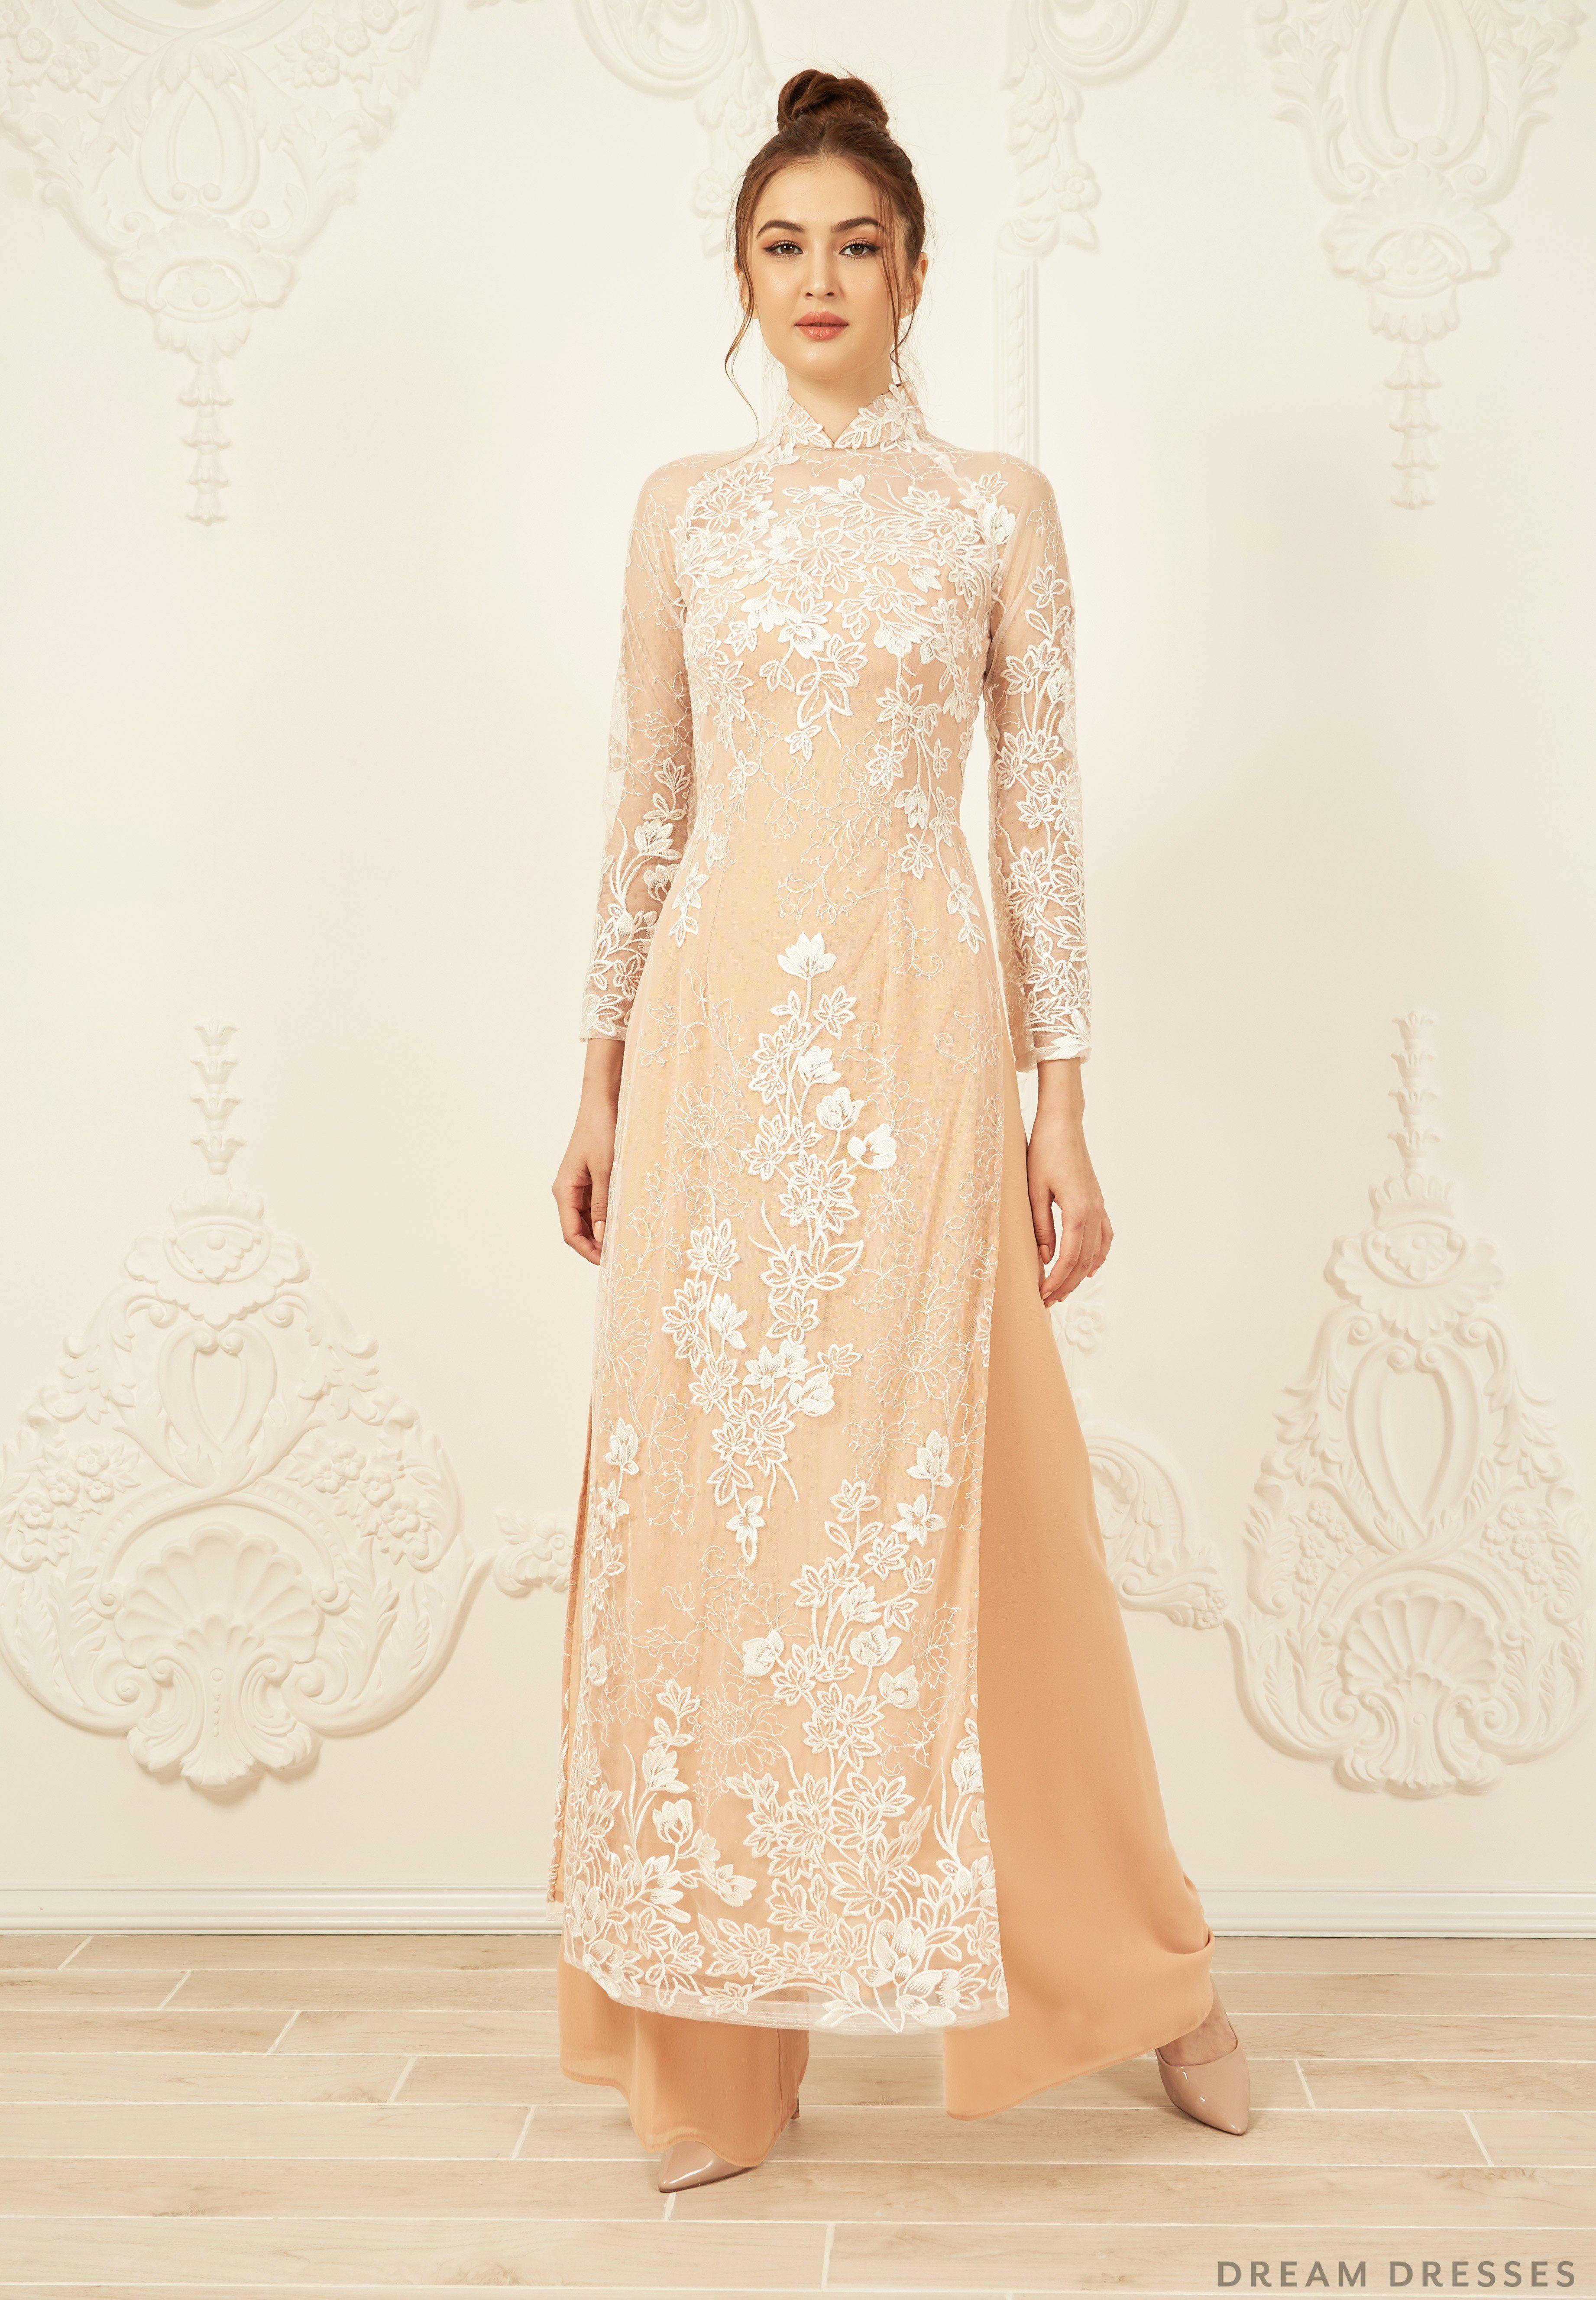 Gold Ao Dai Vietnamese Lace Bridal Dress Dream Dresses